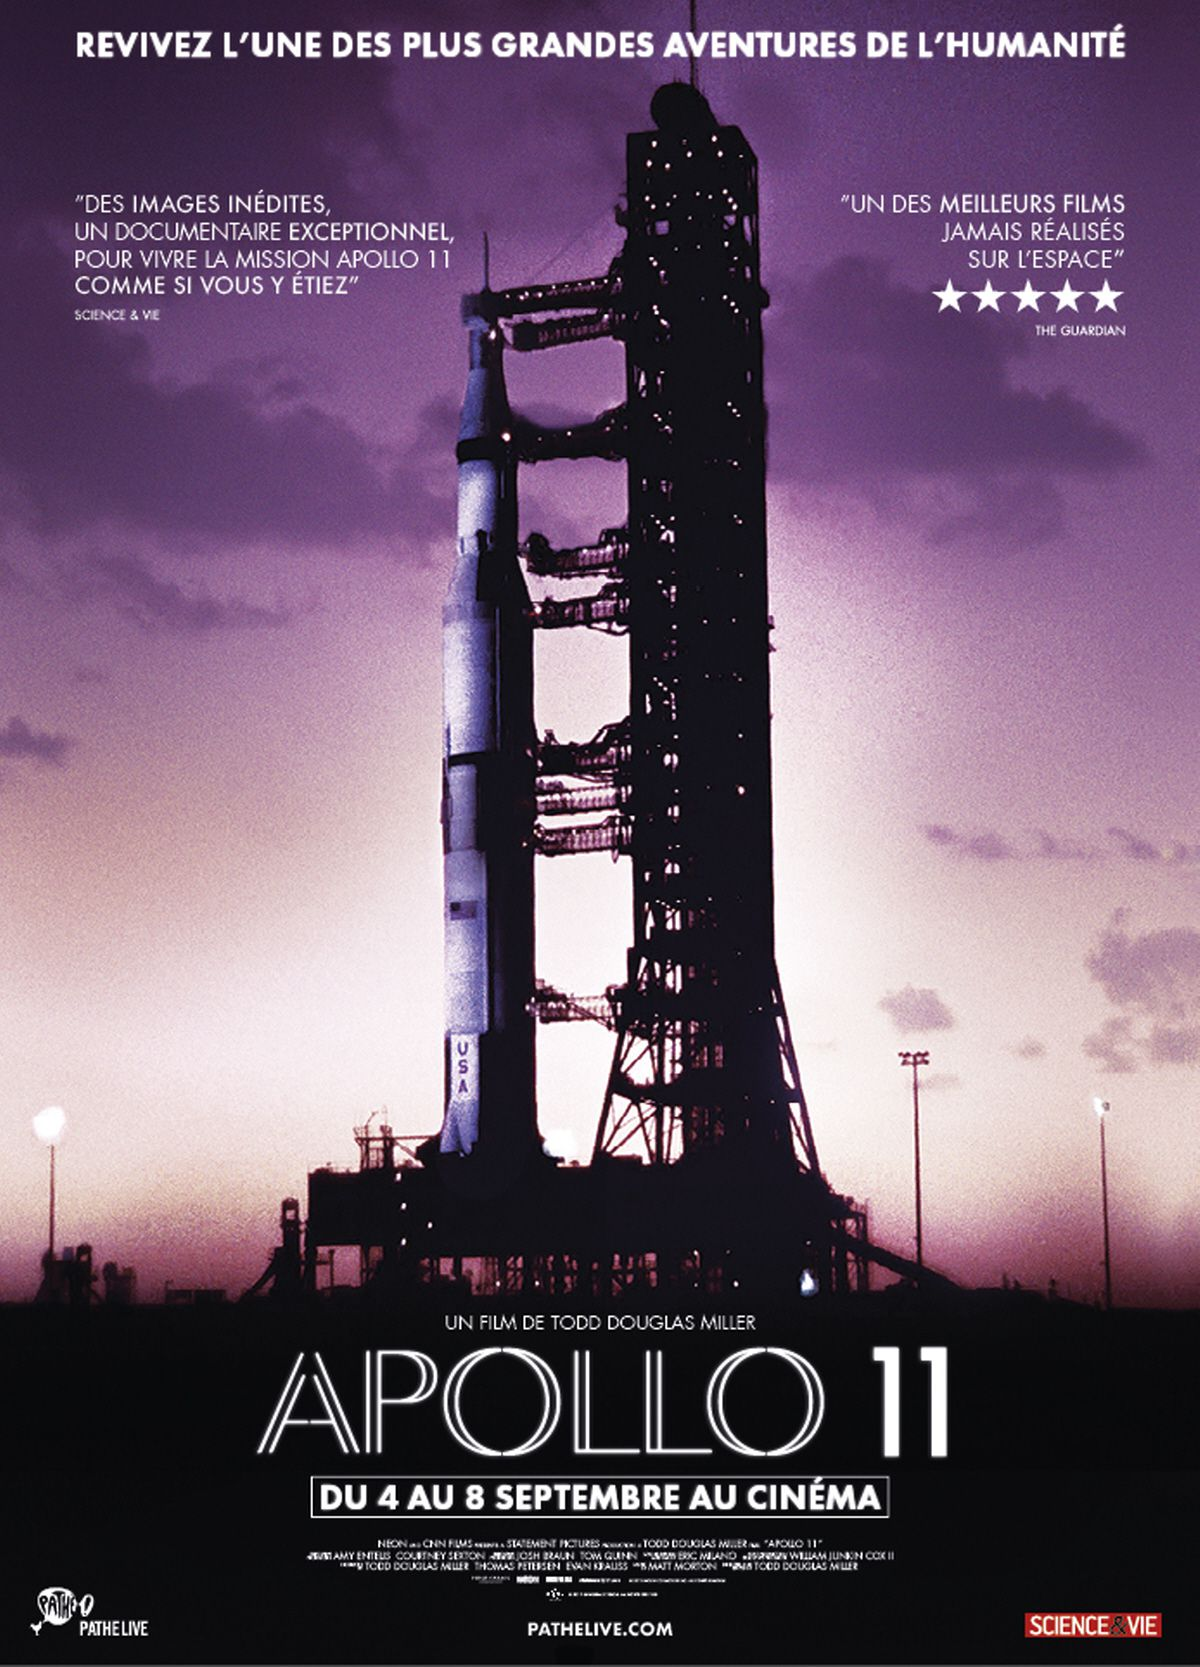 Apollo 11 - Documentaire (2019)